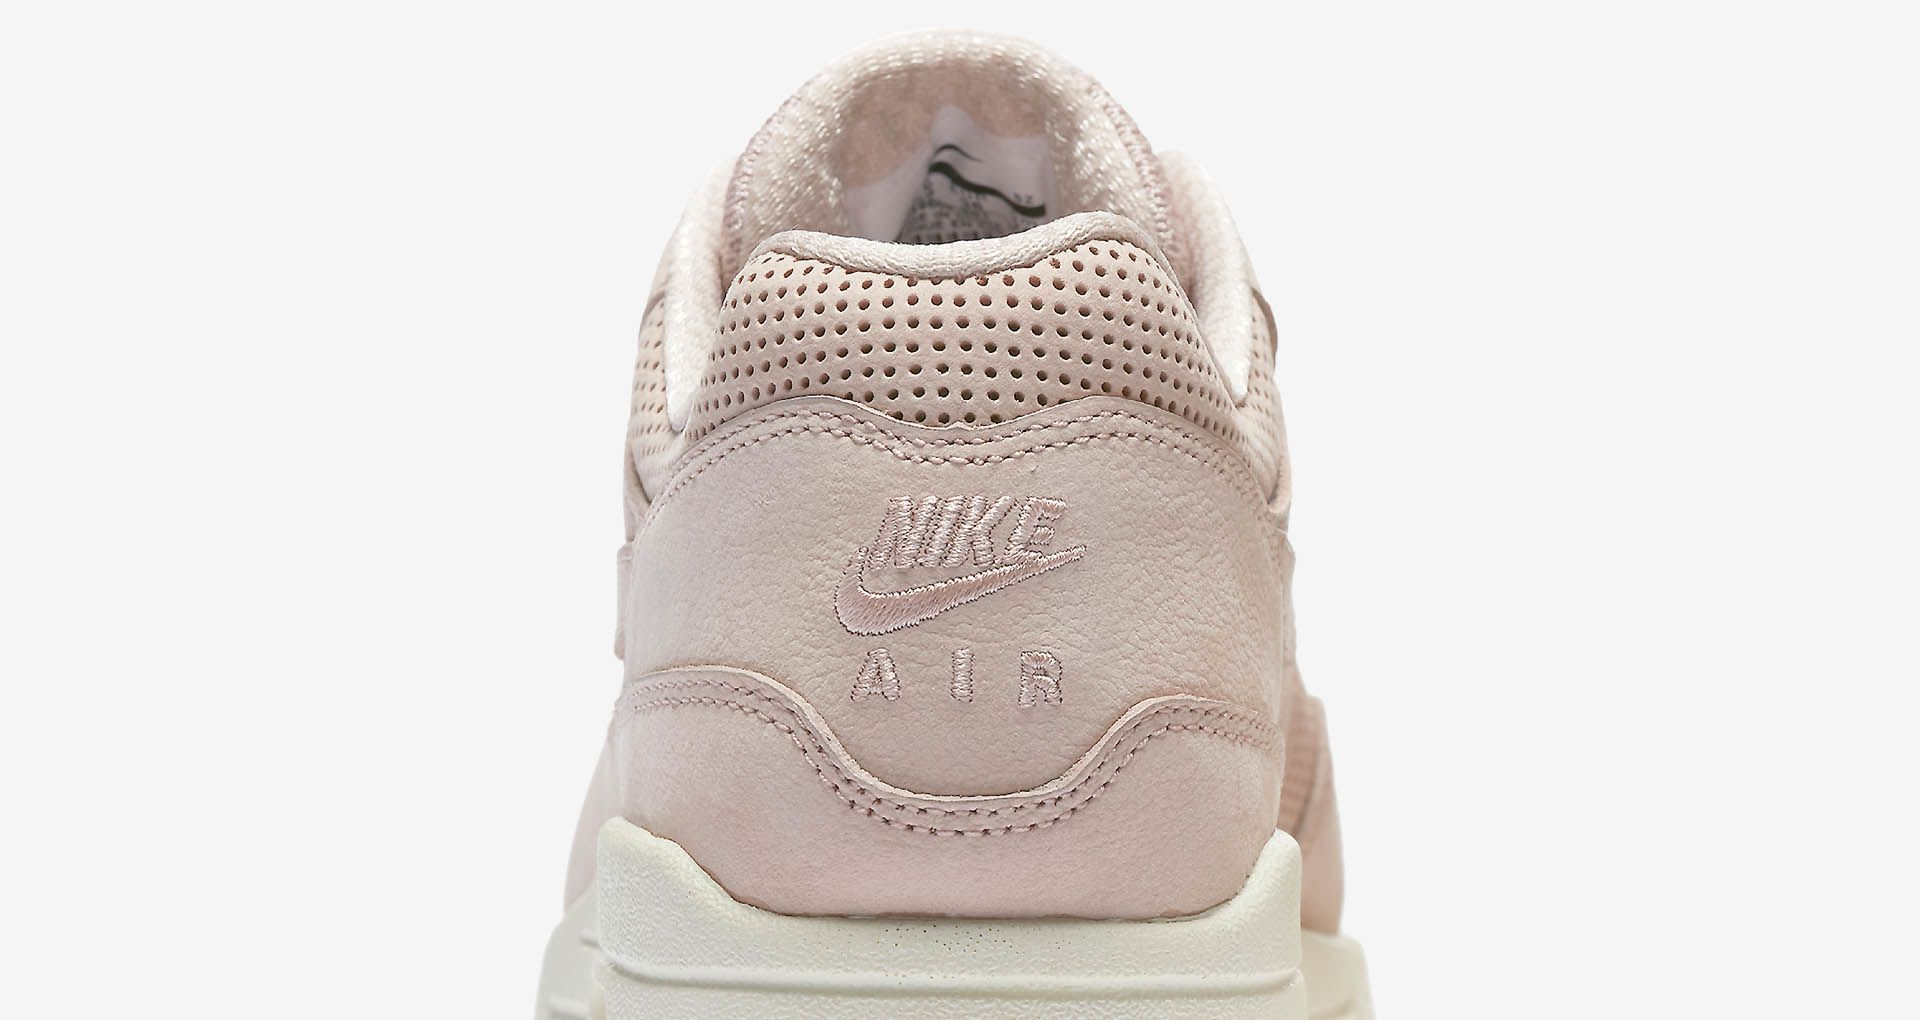 Women's Nike Air Max 1 Pinnacle 'Siltstone Red' Release Date